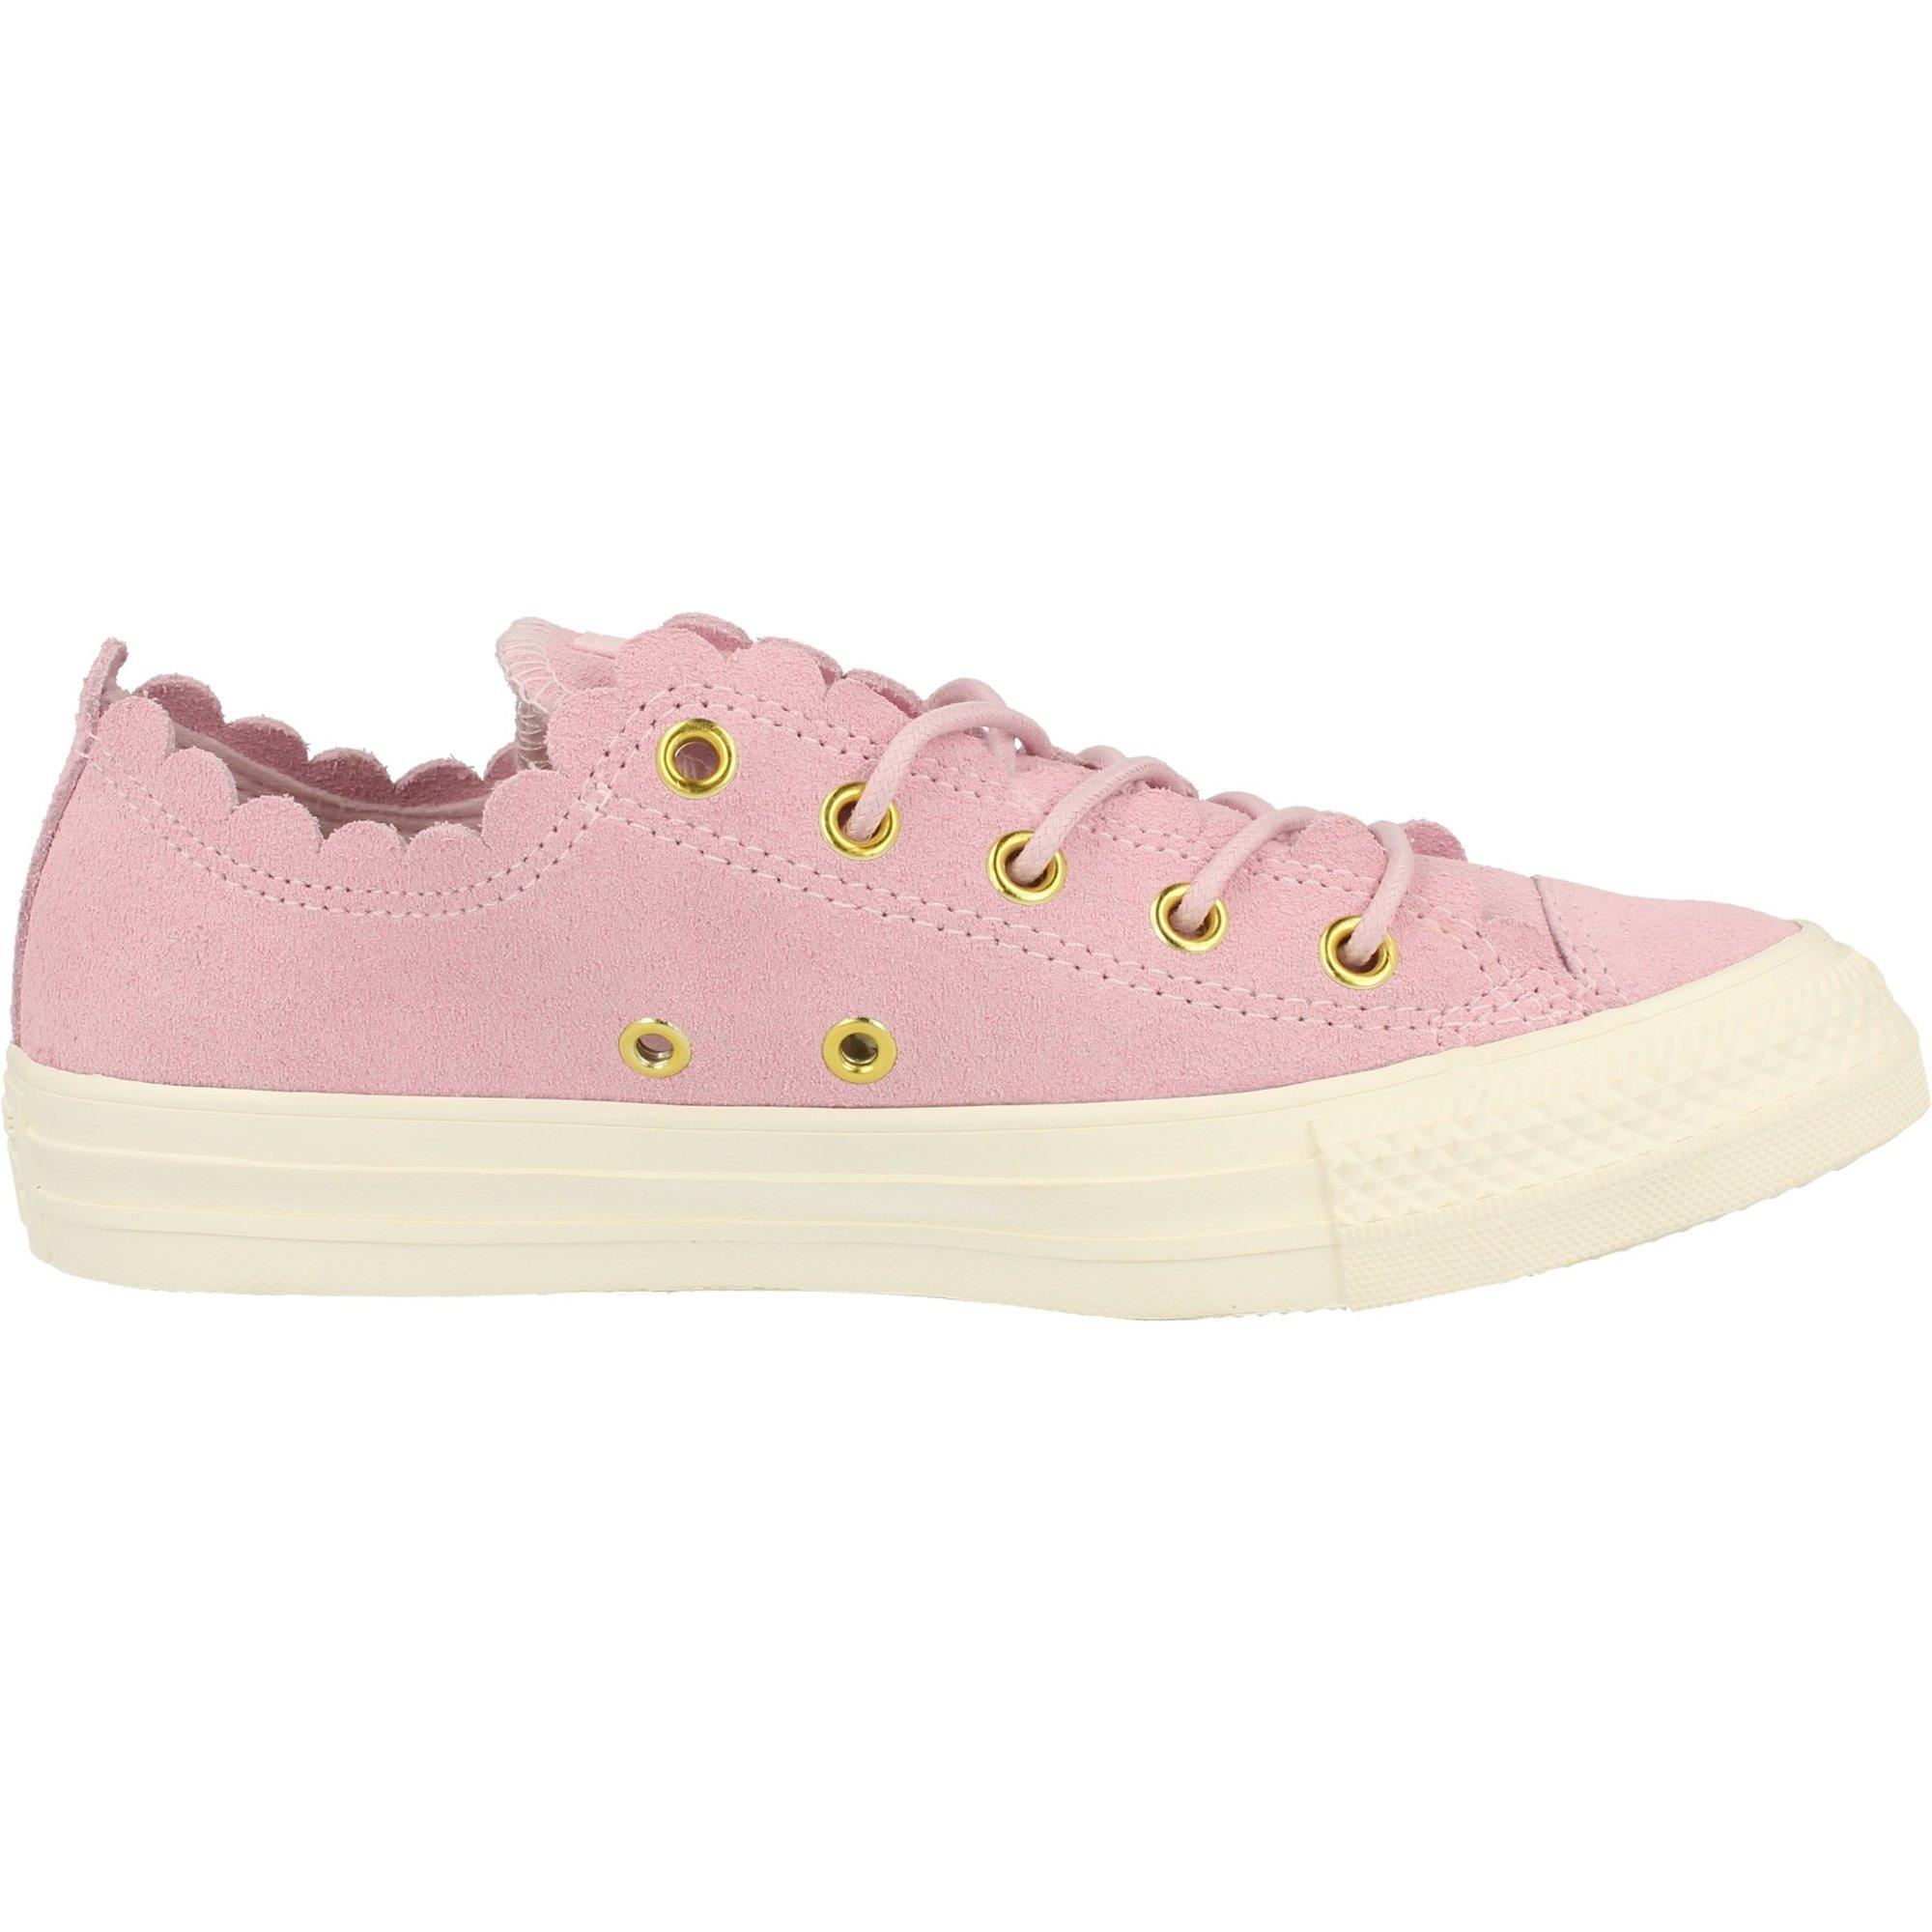 Star Ox Frilly Thrills Pink Foam Suede